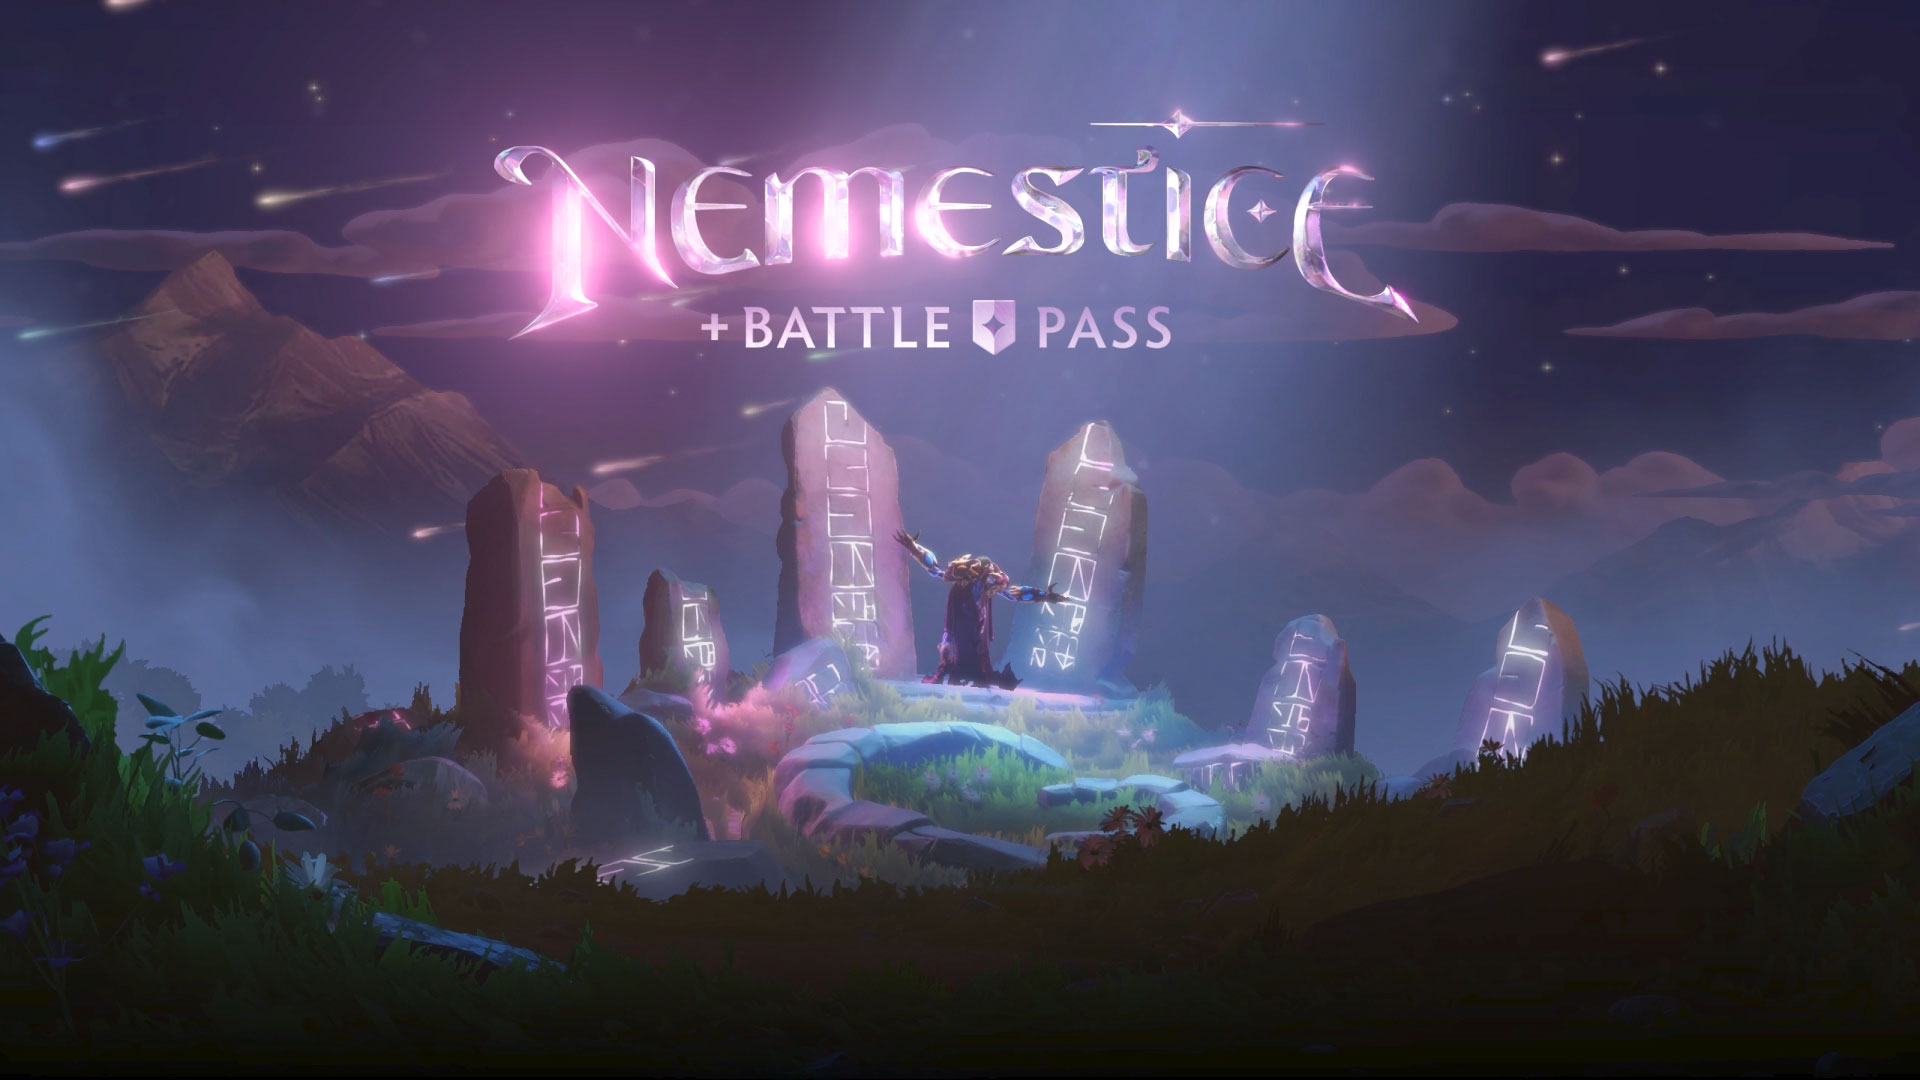 nemestice battle pass dota 2